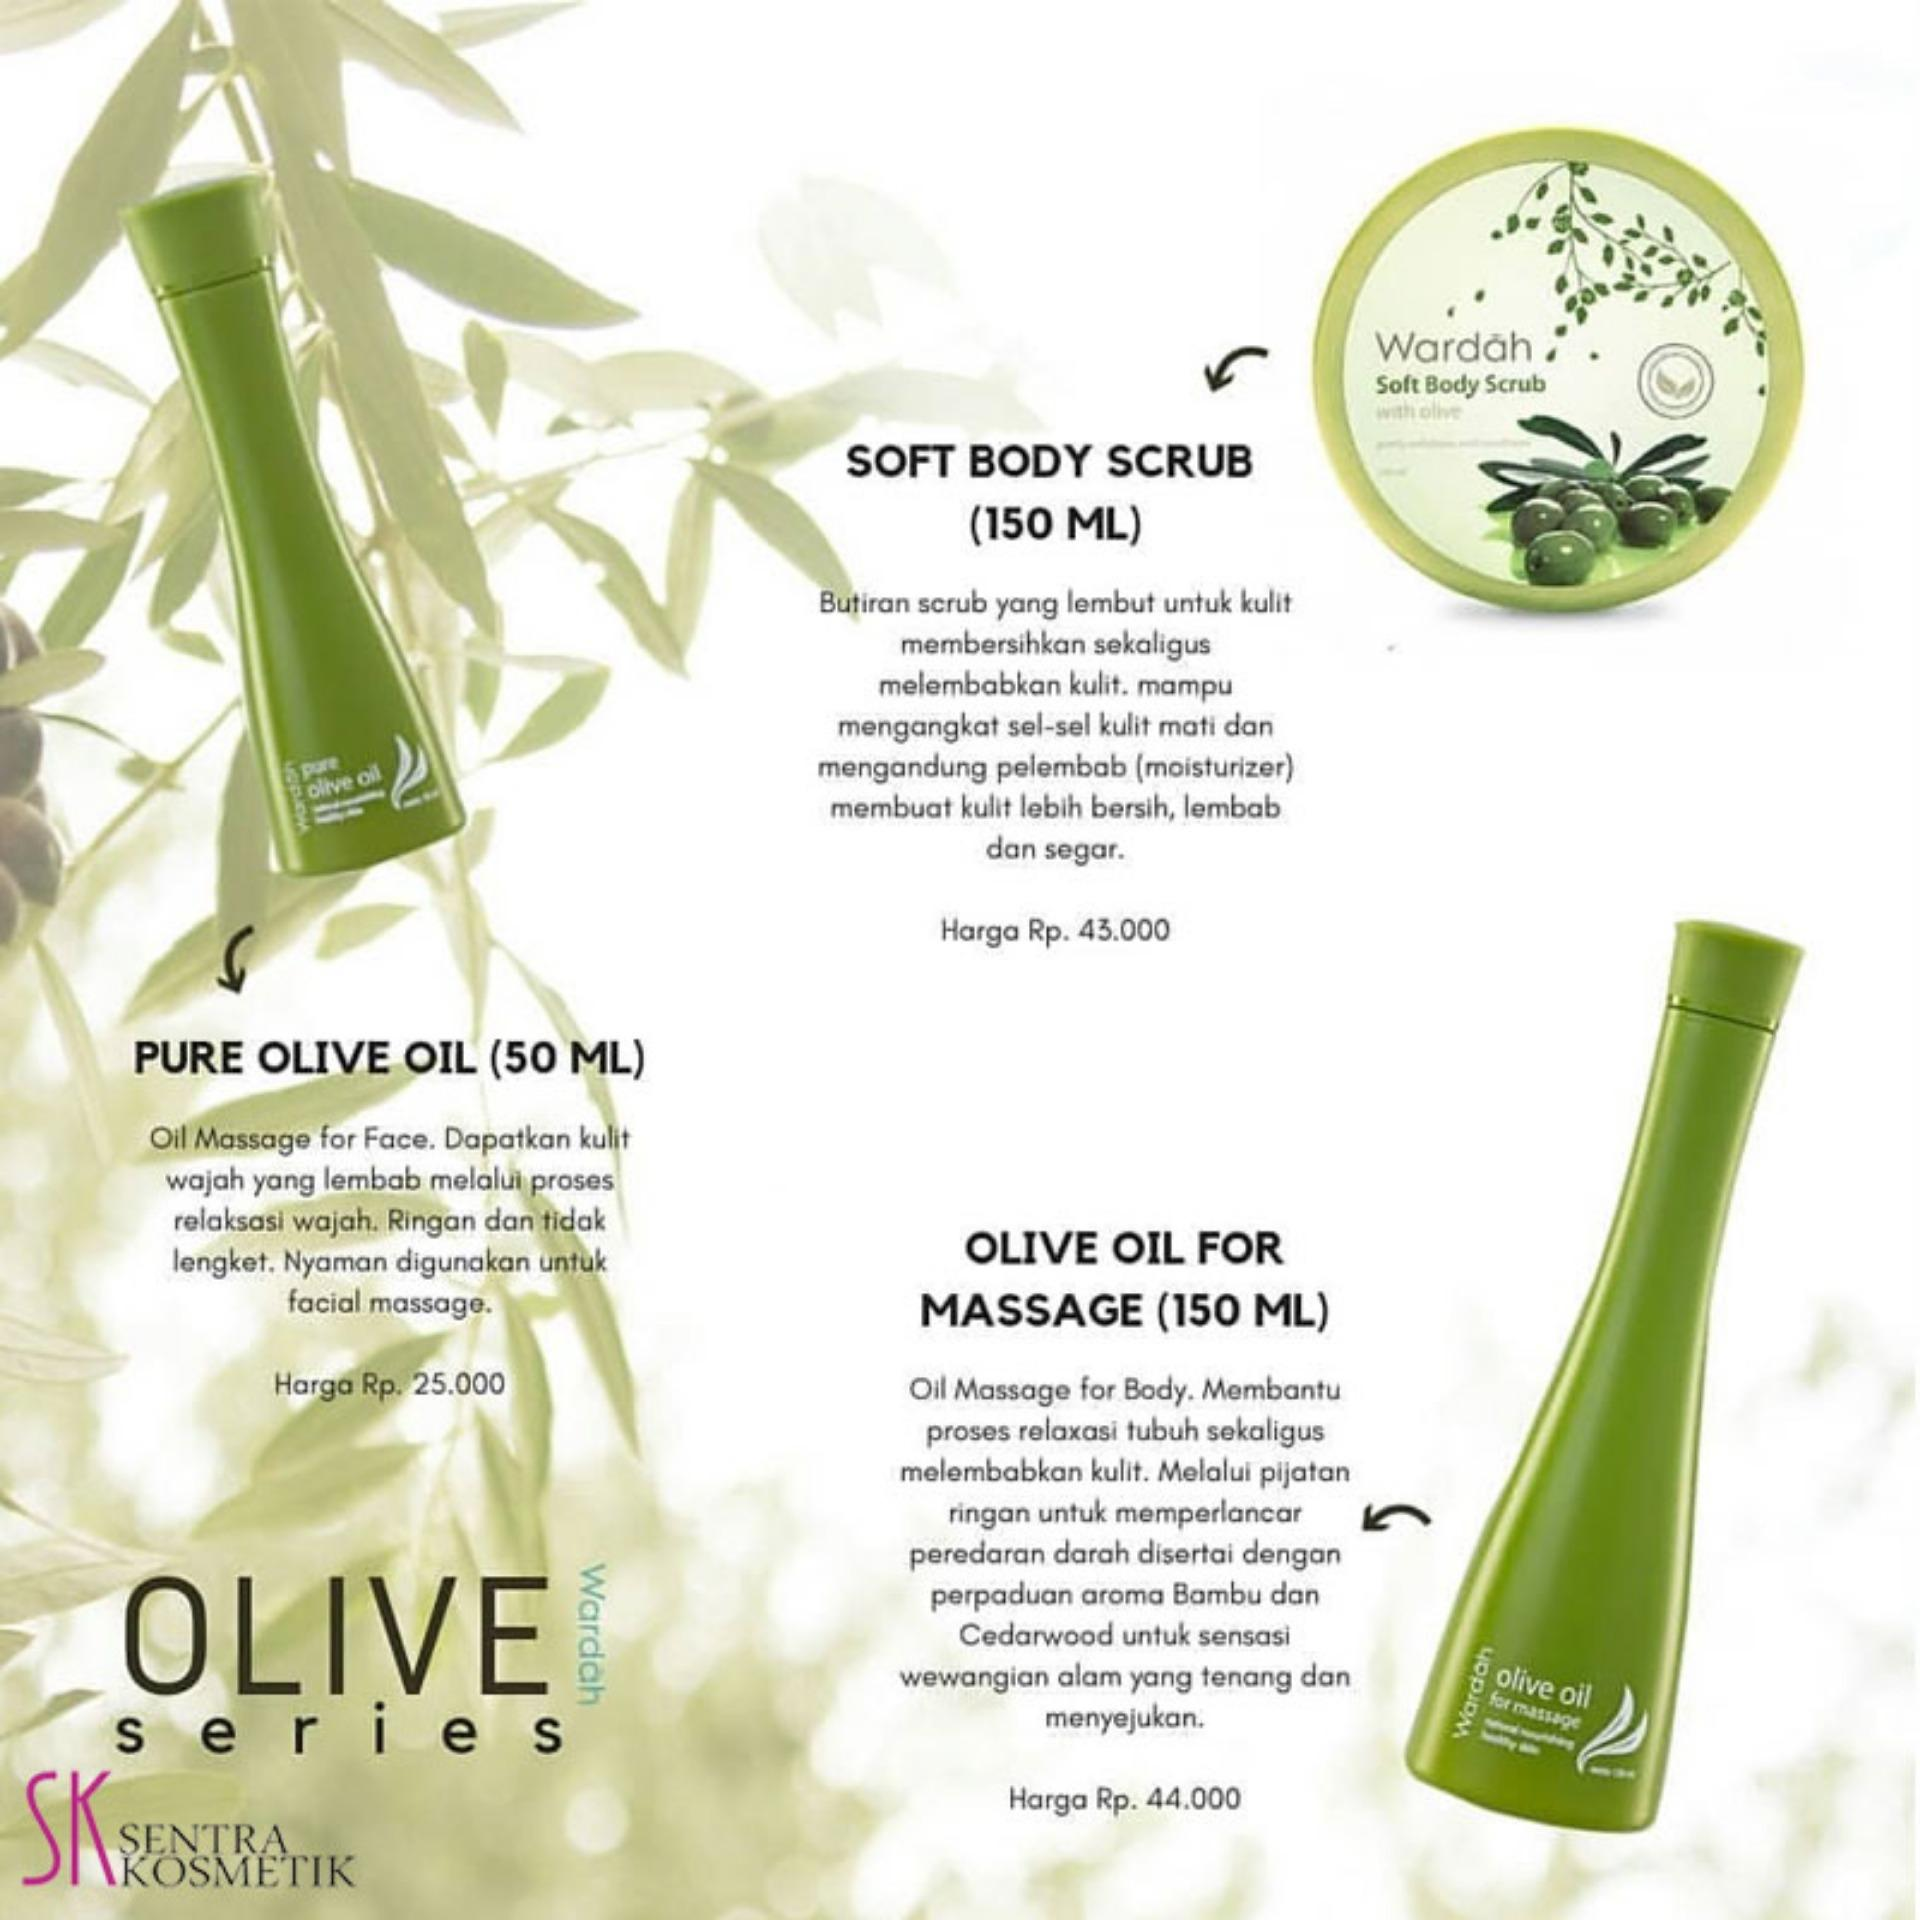 Wardah Pure Olive Oil 50 Ml Minyak Zaitun Wardah Lazada Indonesia